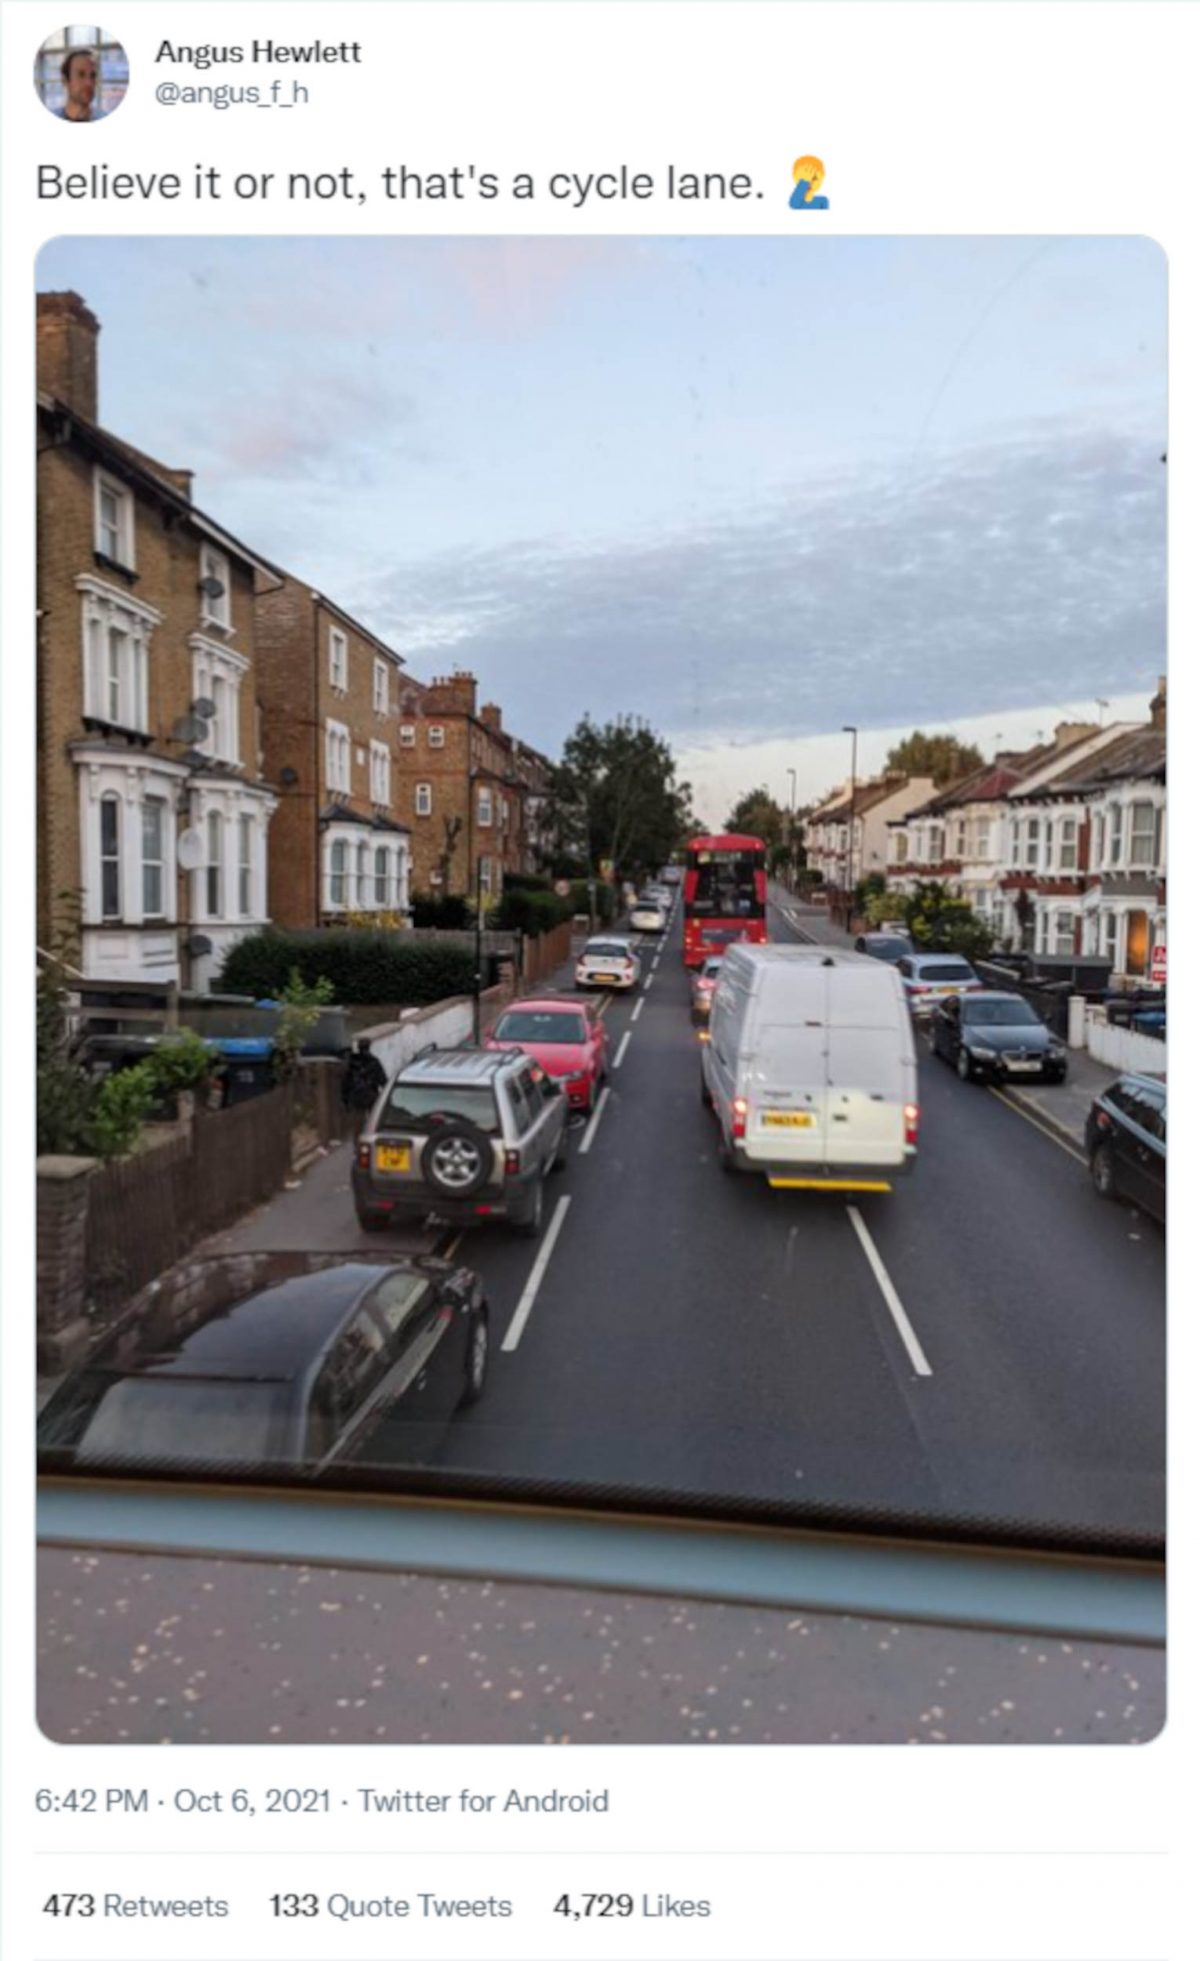 Angus Hewlett bike lane tweet